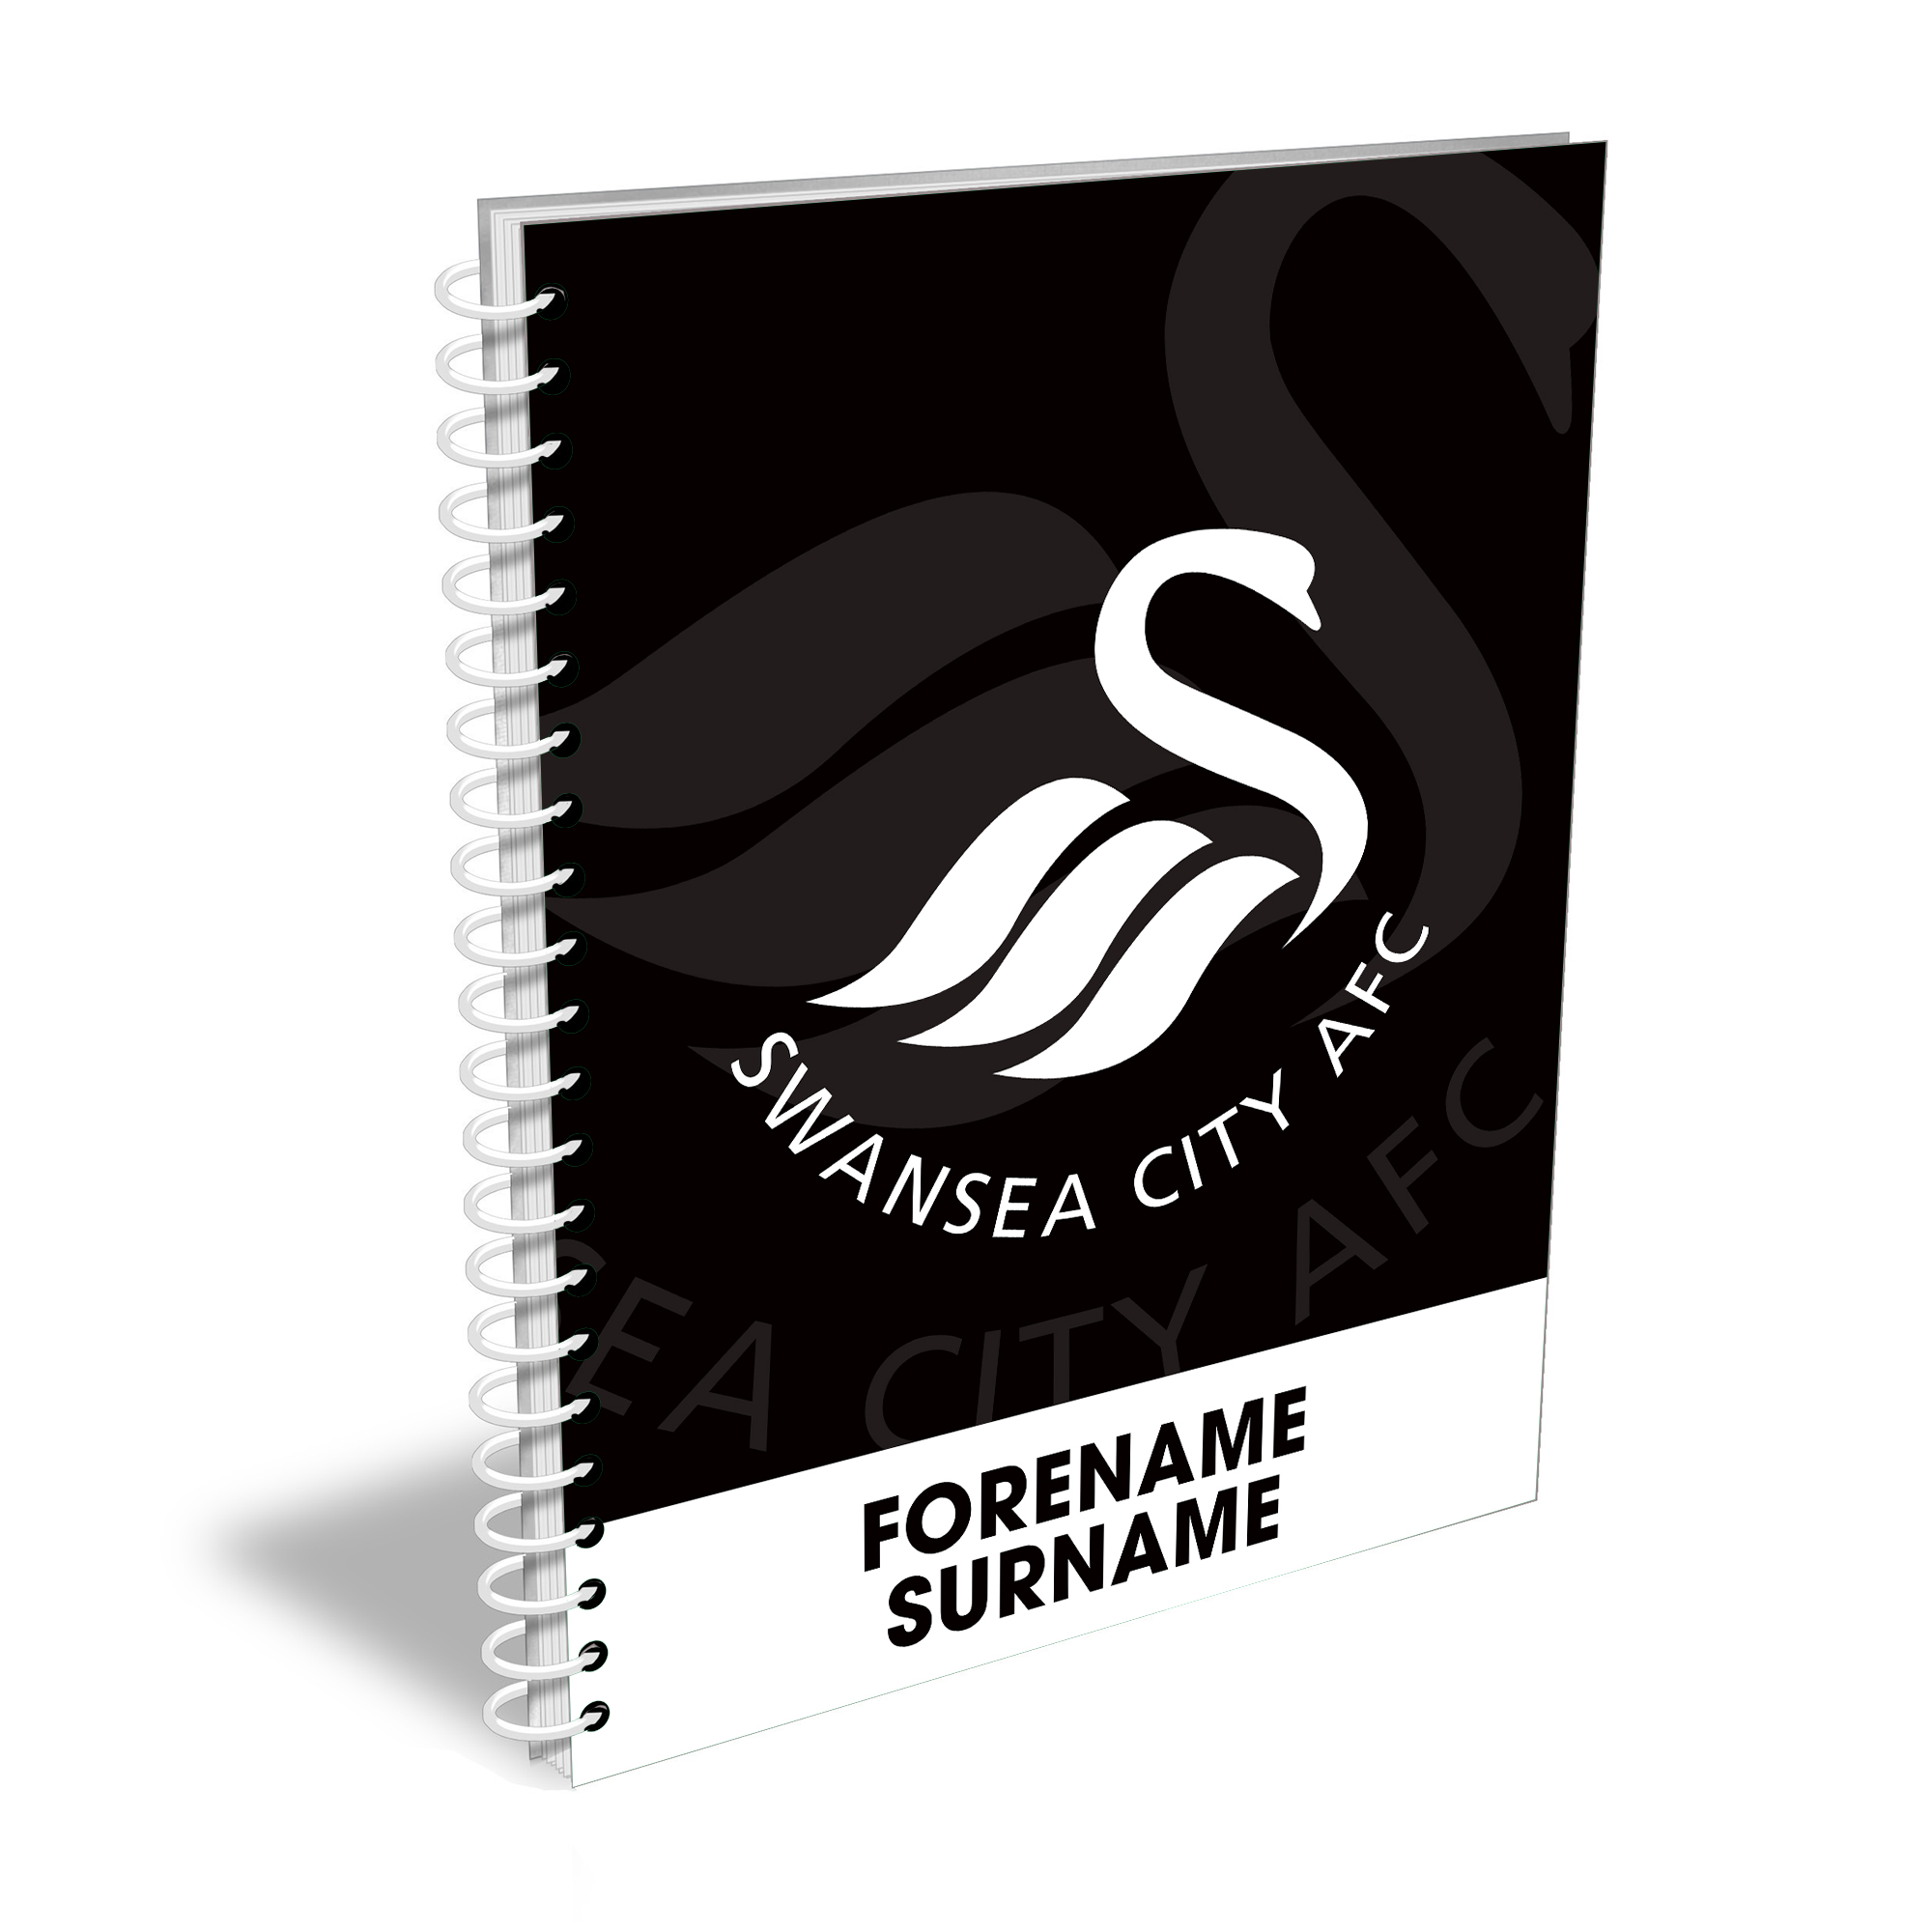 Swansea City AFC Bold Crest Notebook